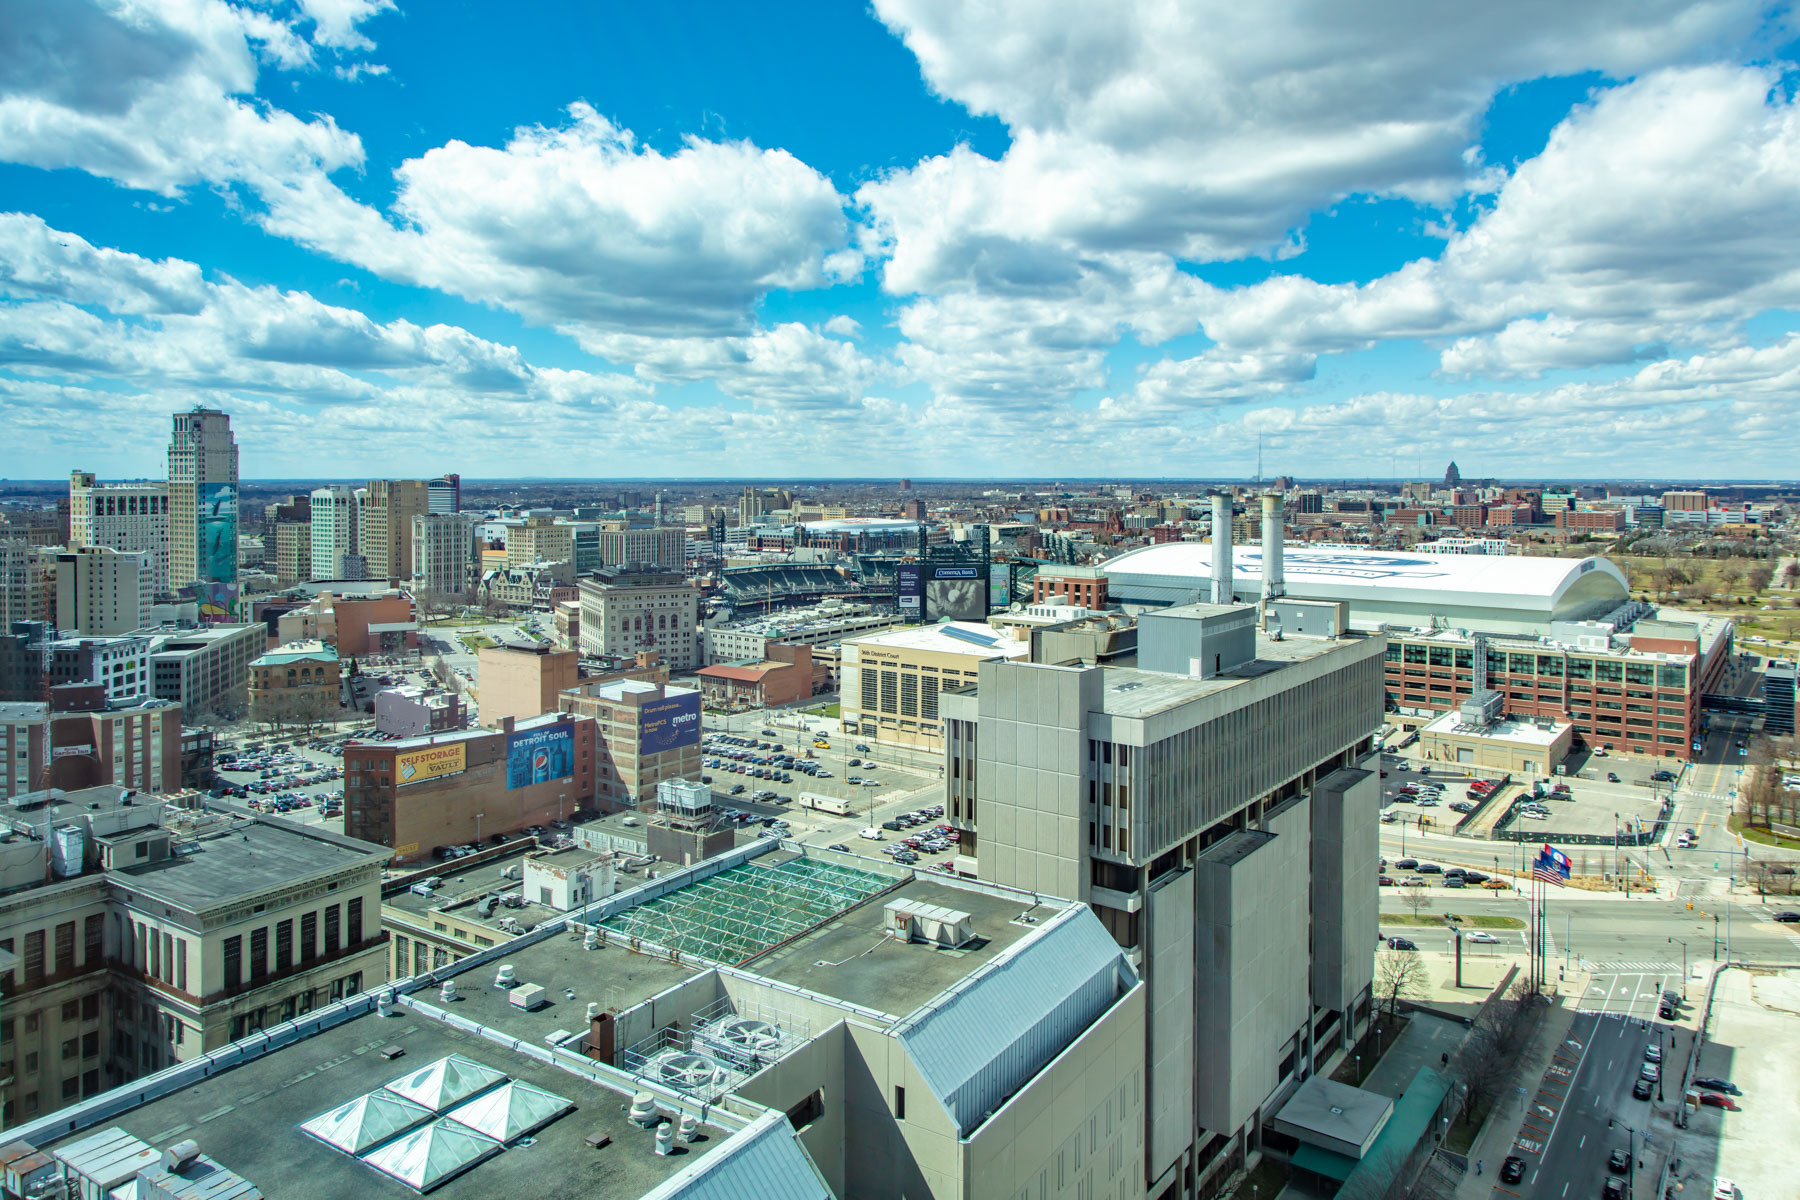 Detroit from GtCH Room - 1z3a7175